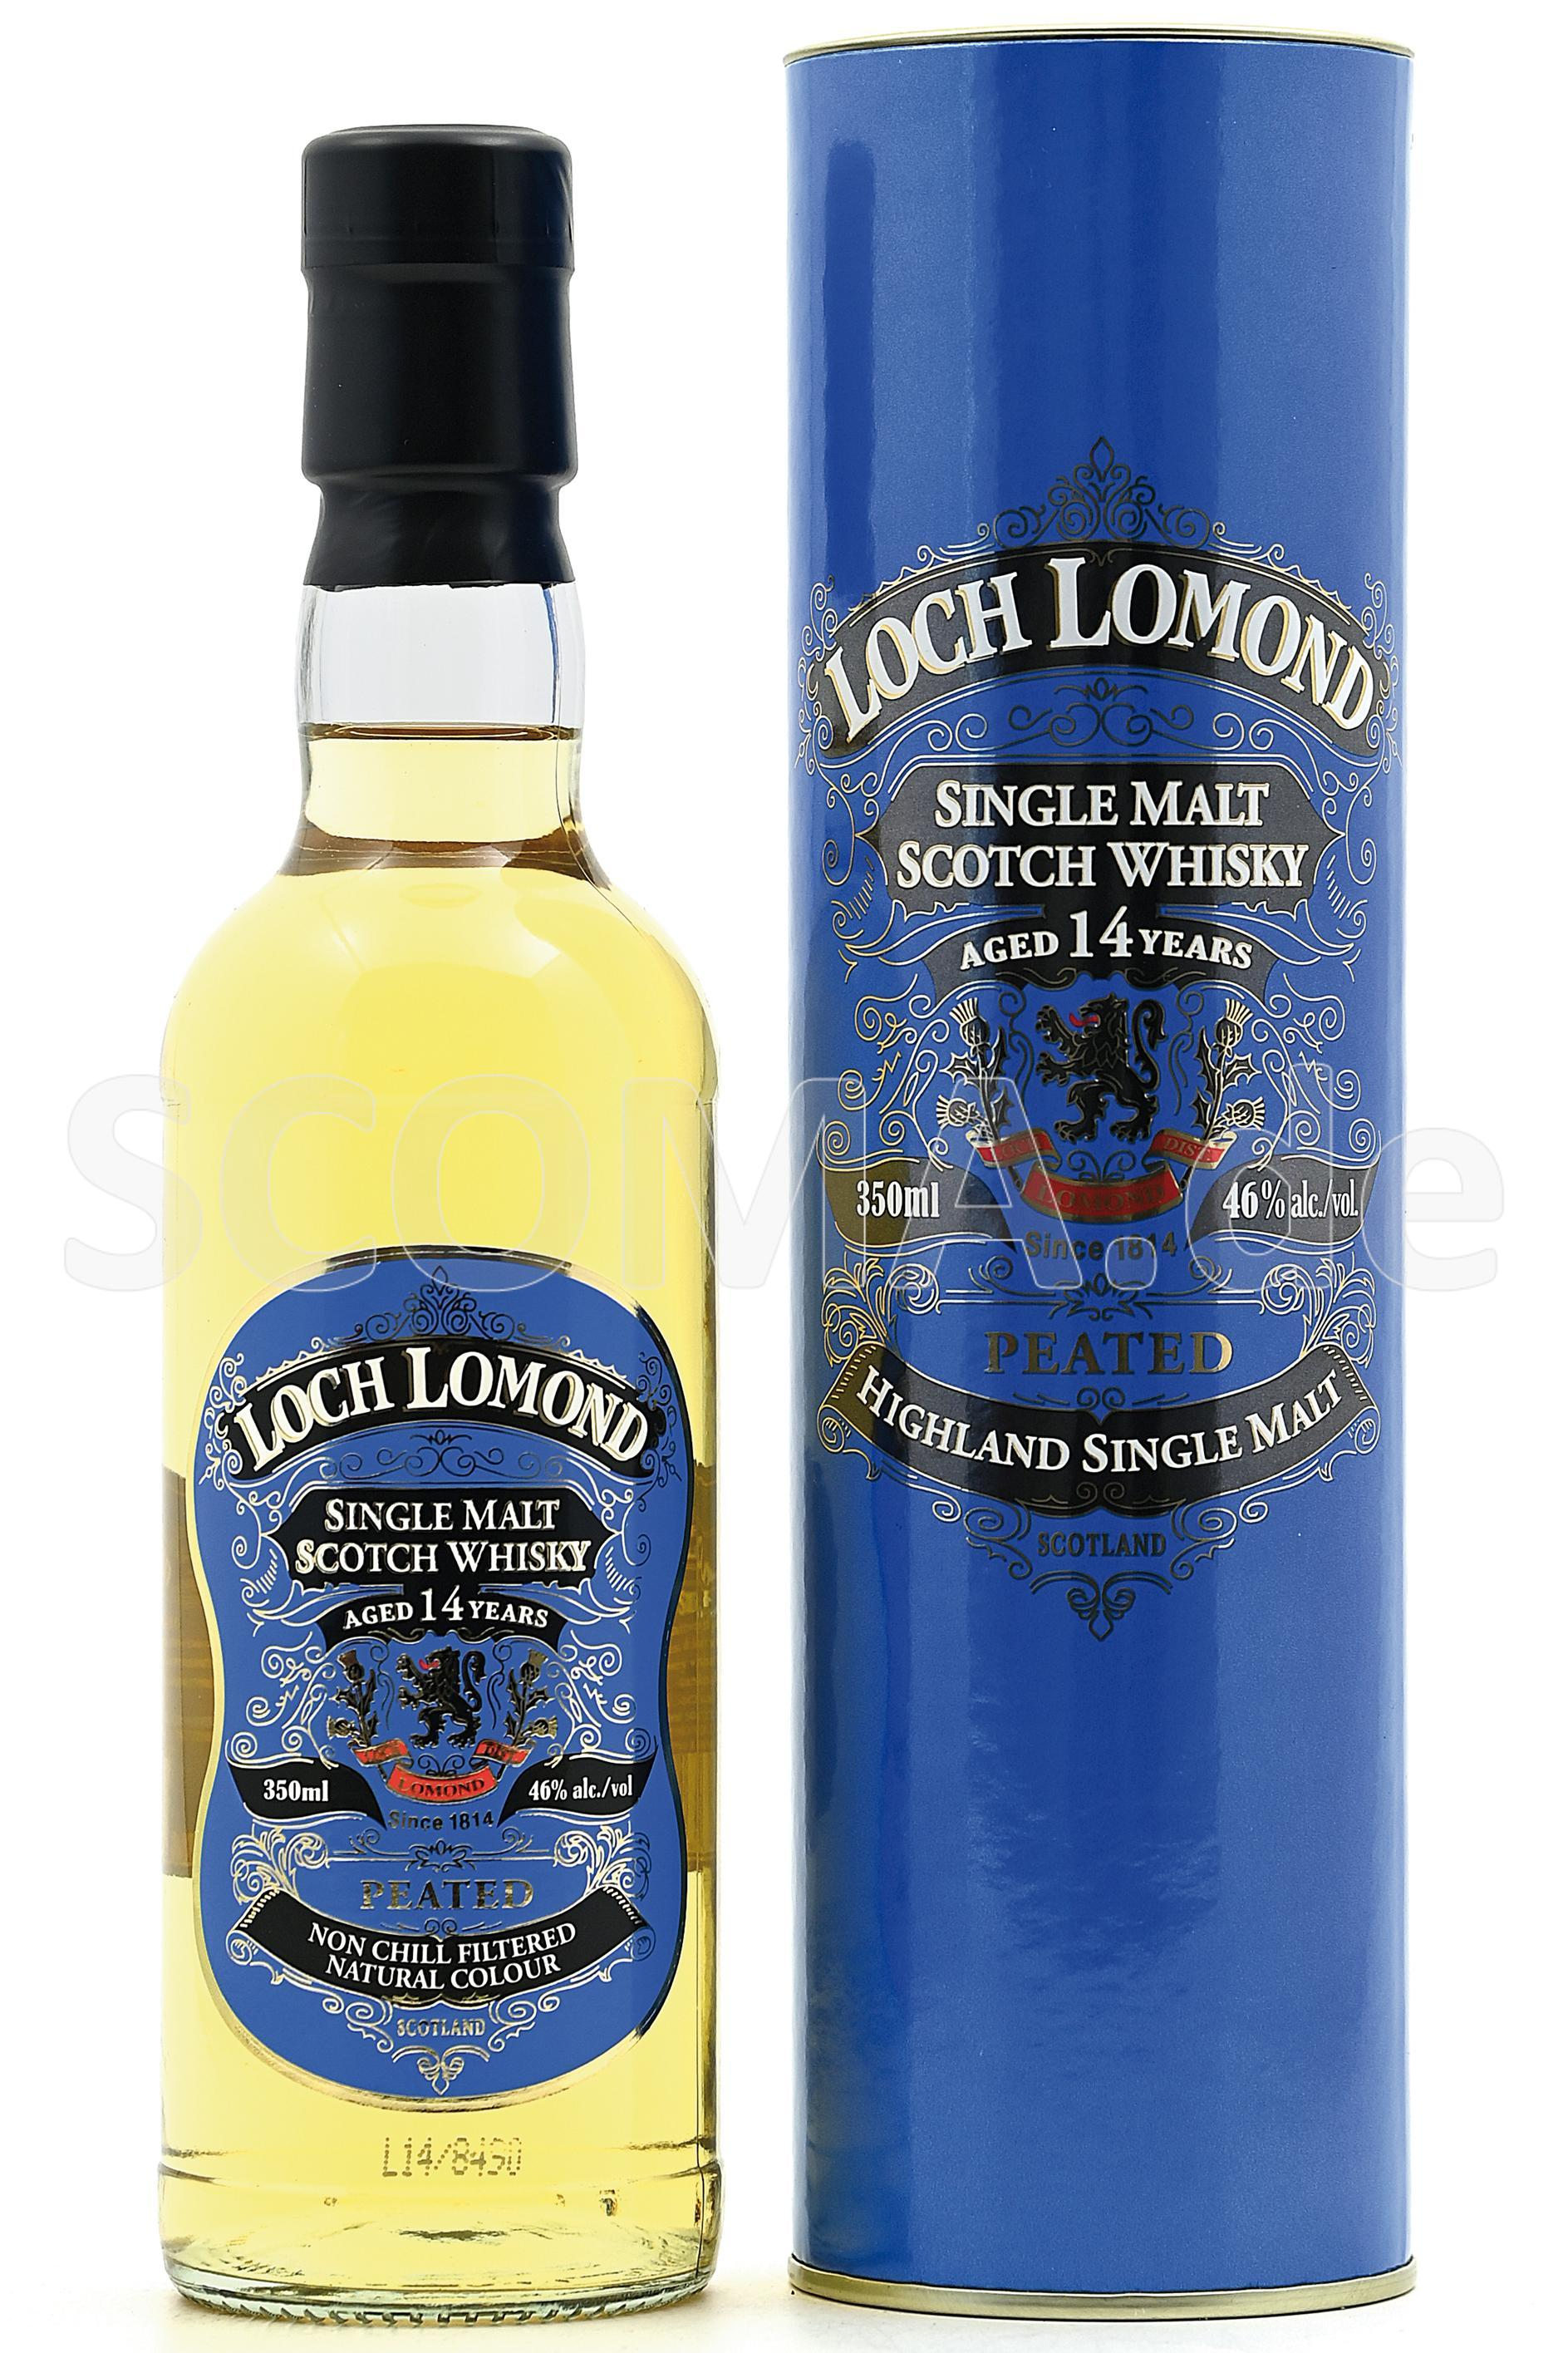 Loch Lomond 14 years Peated